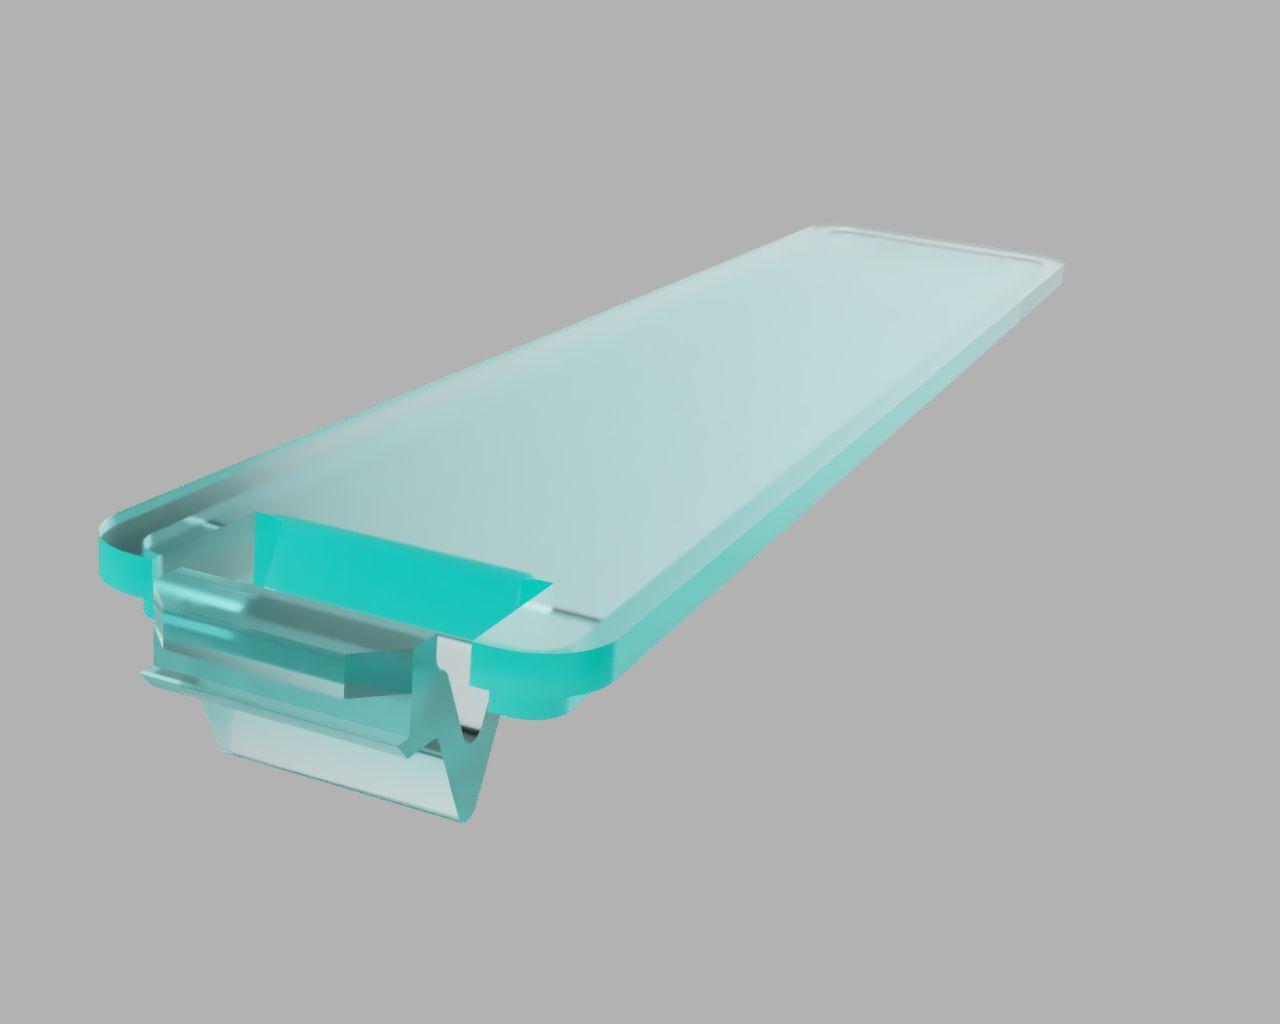 Jetson Nano Case|Autodesk Online Gallery